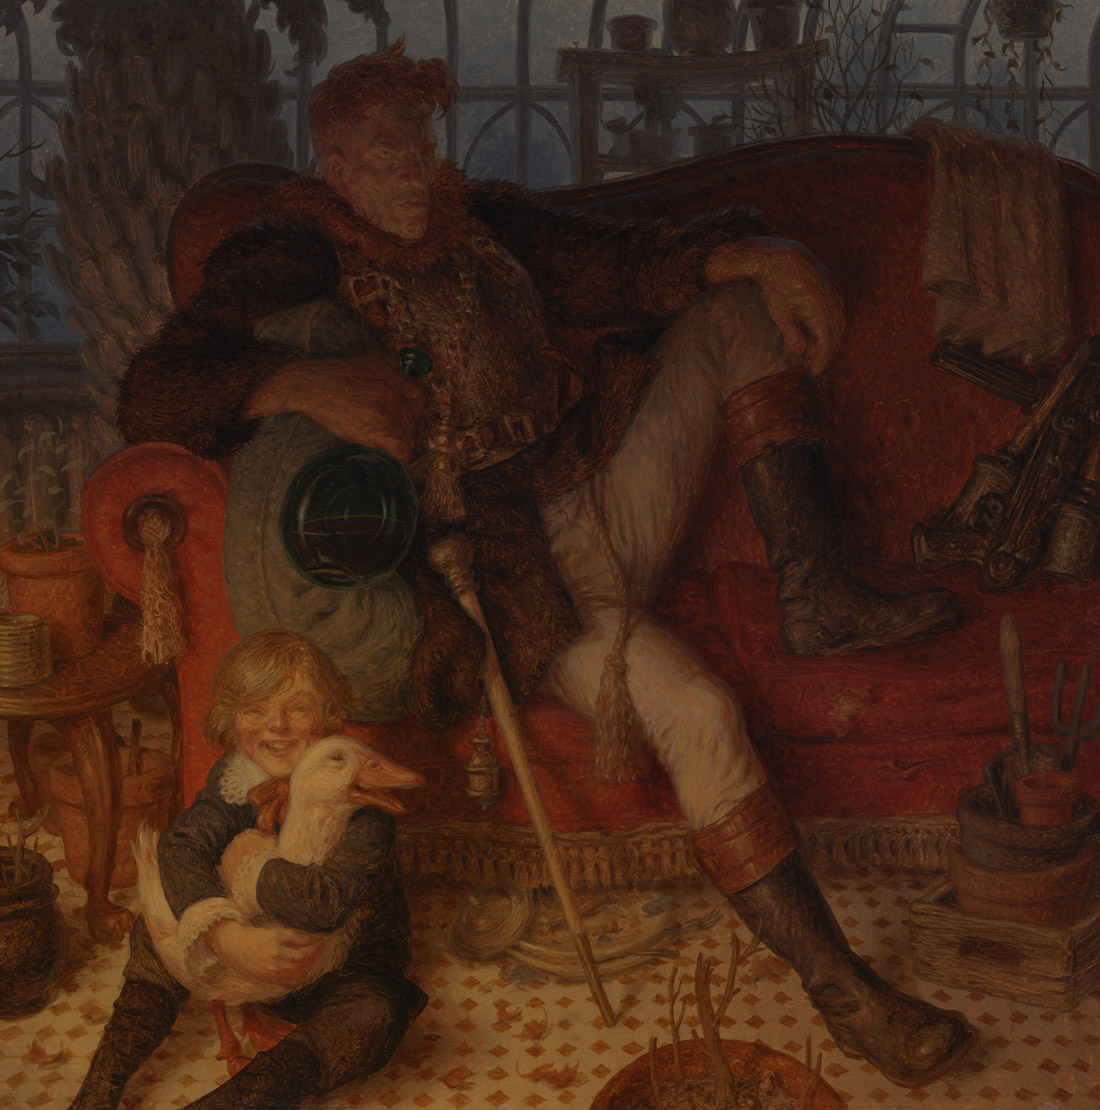 Black Regent of Labrador - Peter ferguson